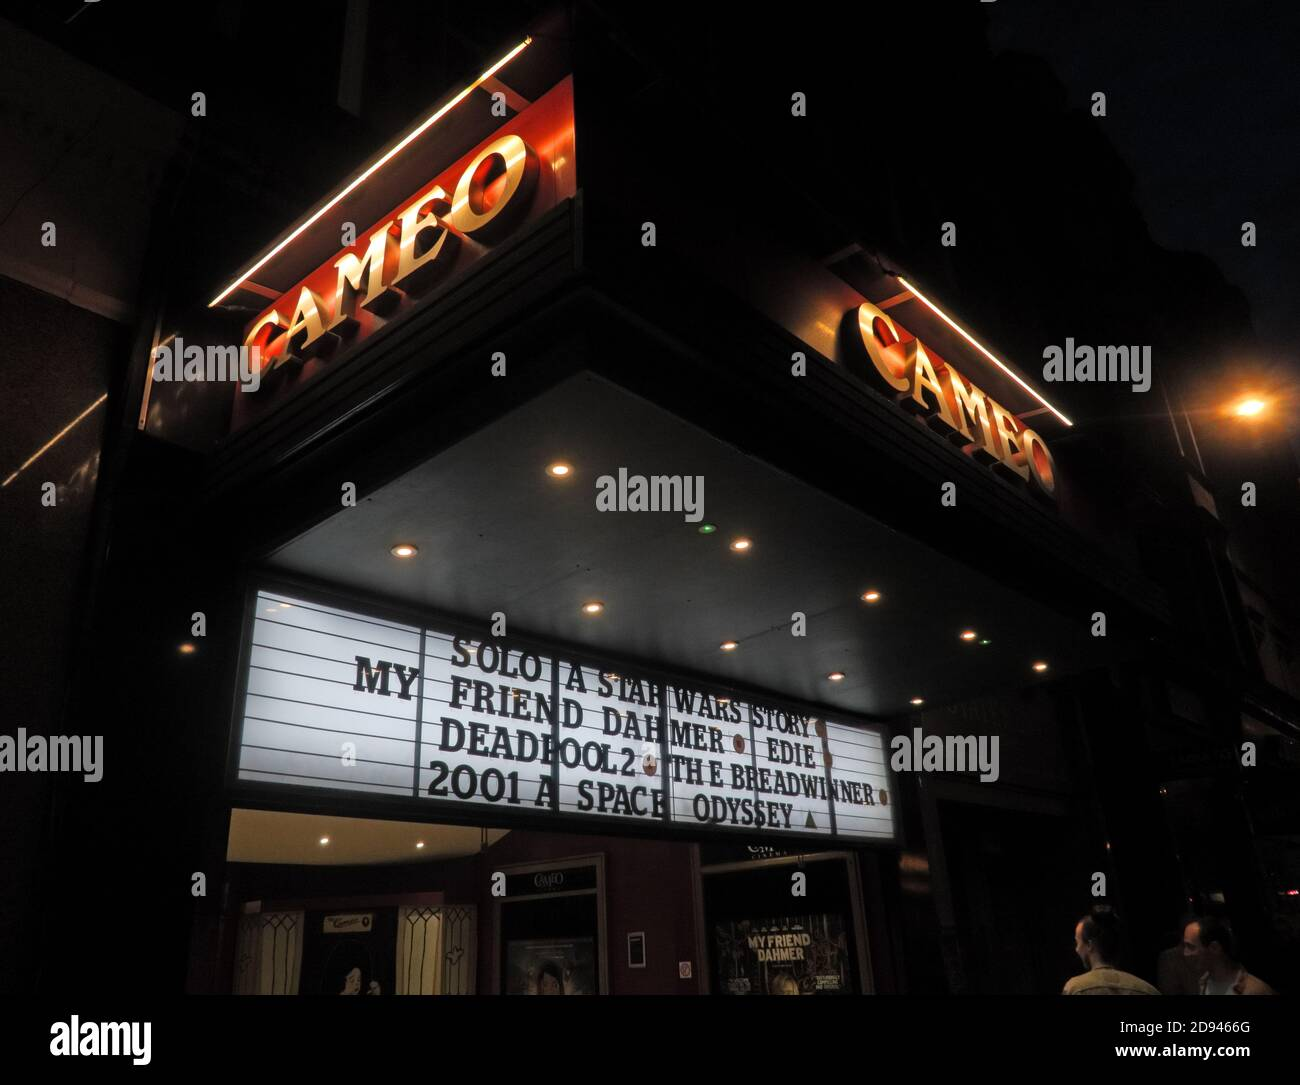 Dieses Stockfoto: Cameo Cinema,Home Street,Tollcross,Edinburgh - Solo A Starwars Story,2001 A Space Odyssee - 2D9466